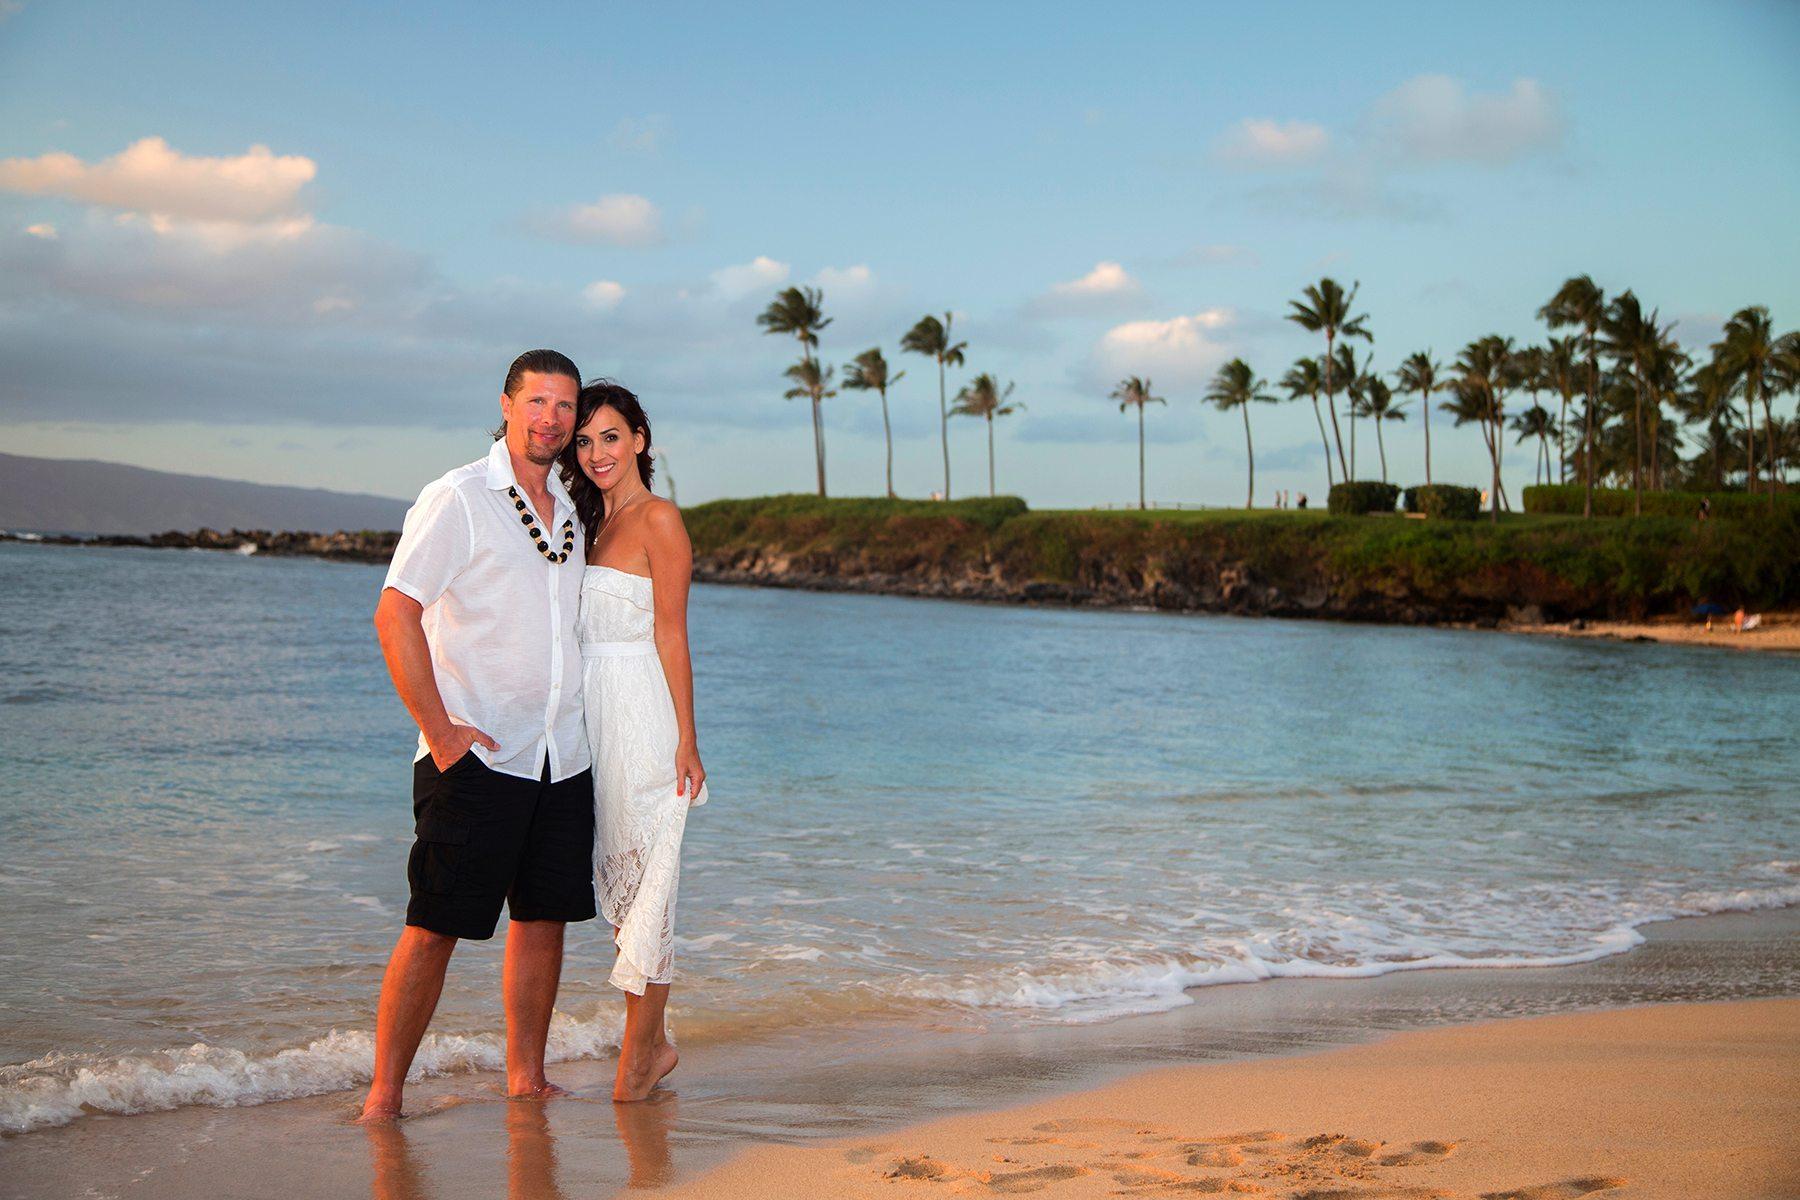 maui couples portaits 1_Behind The Lens Maui.jpg